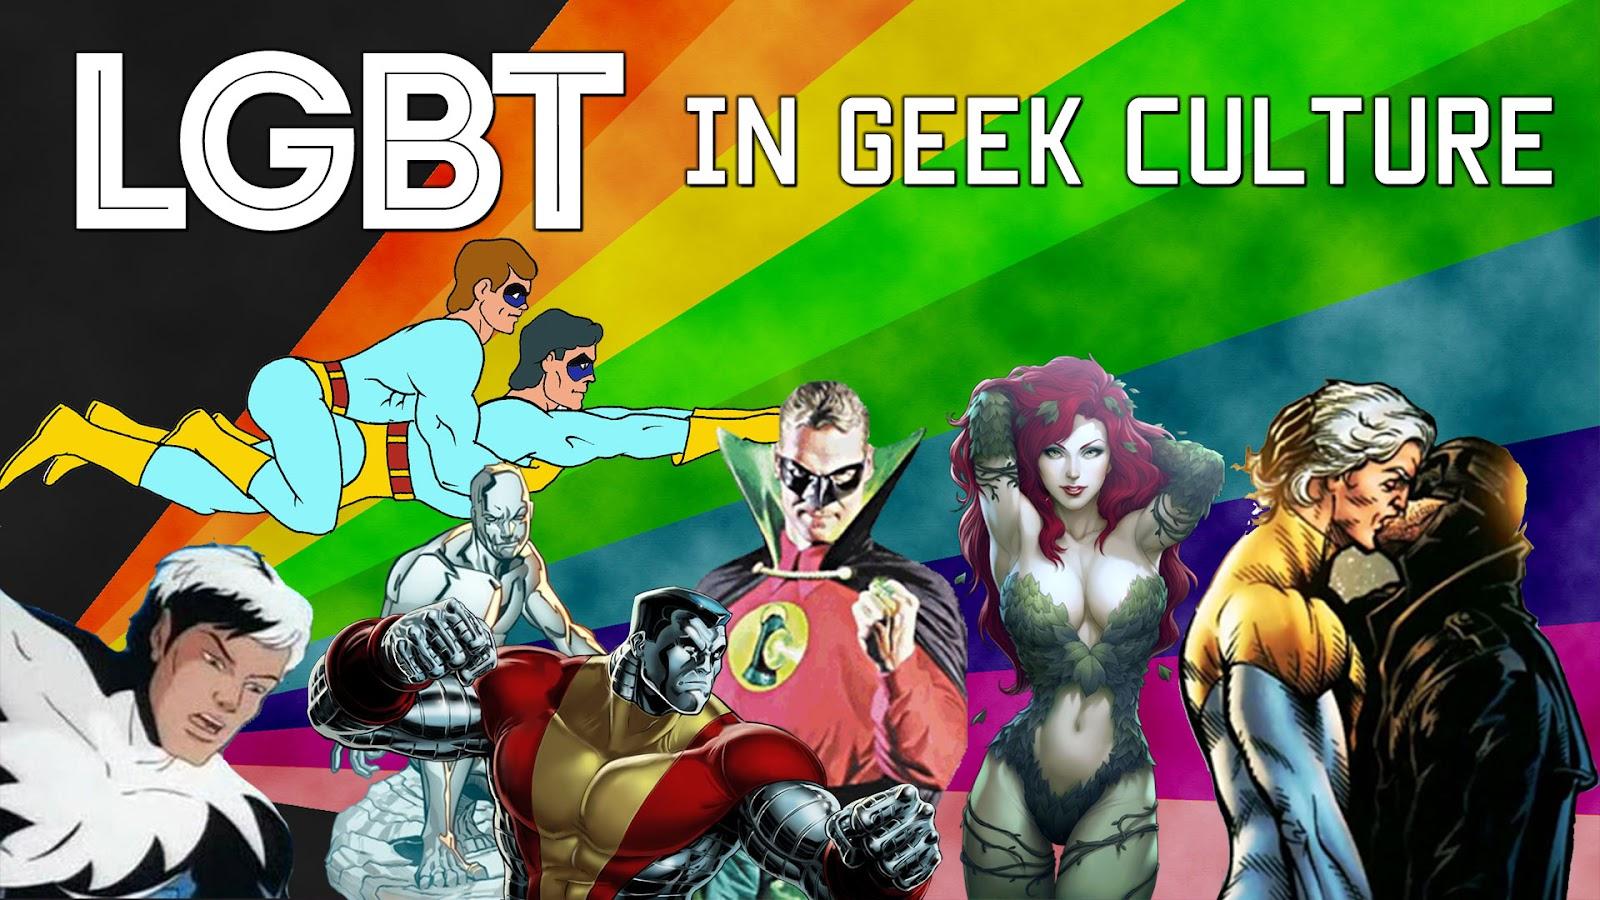 LGBT characters in comics